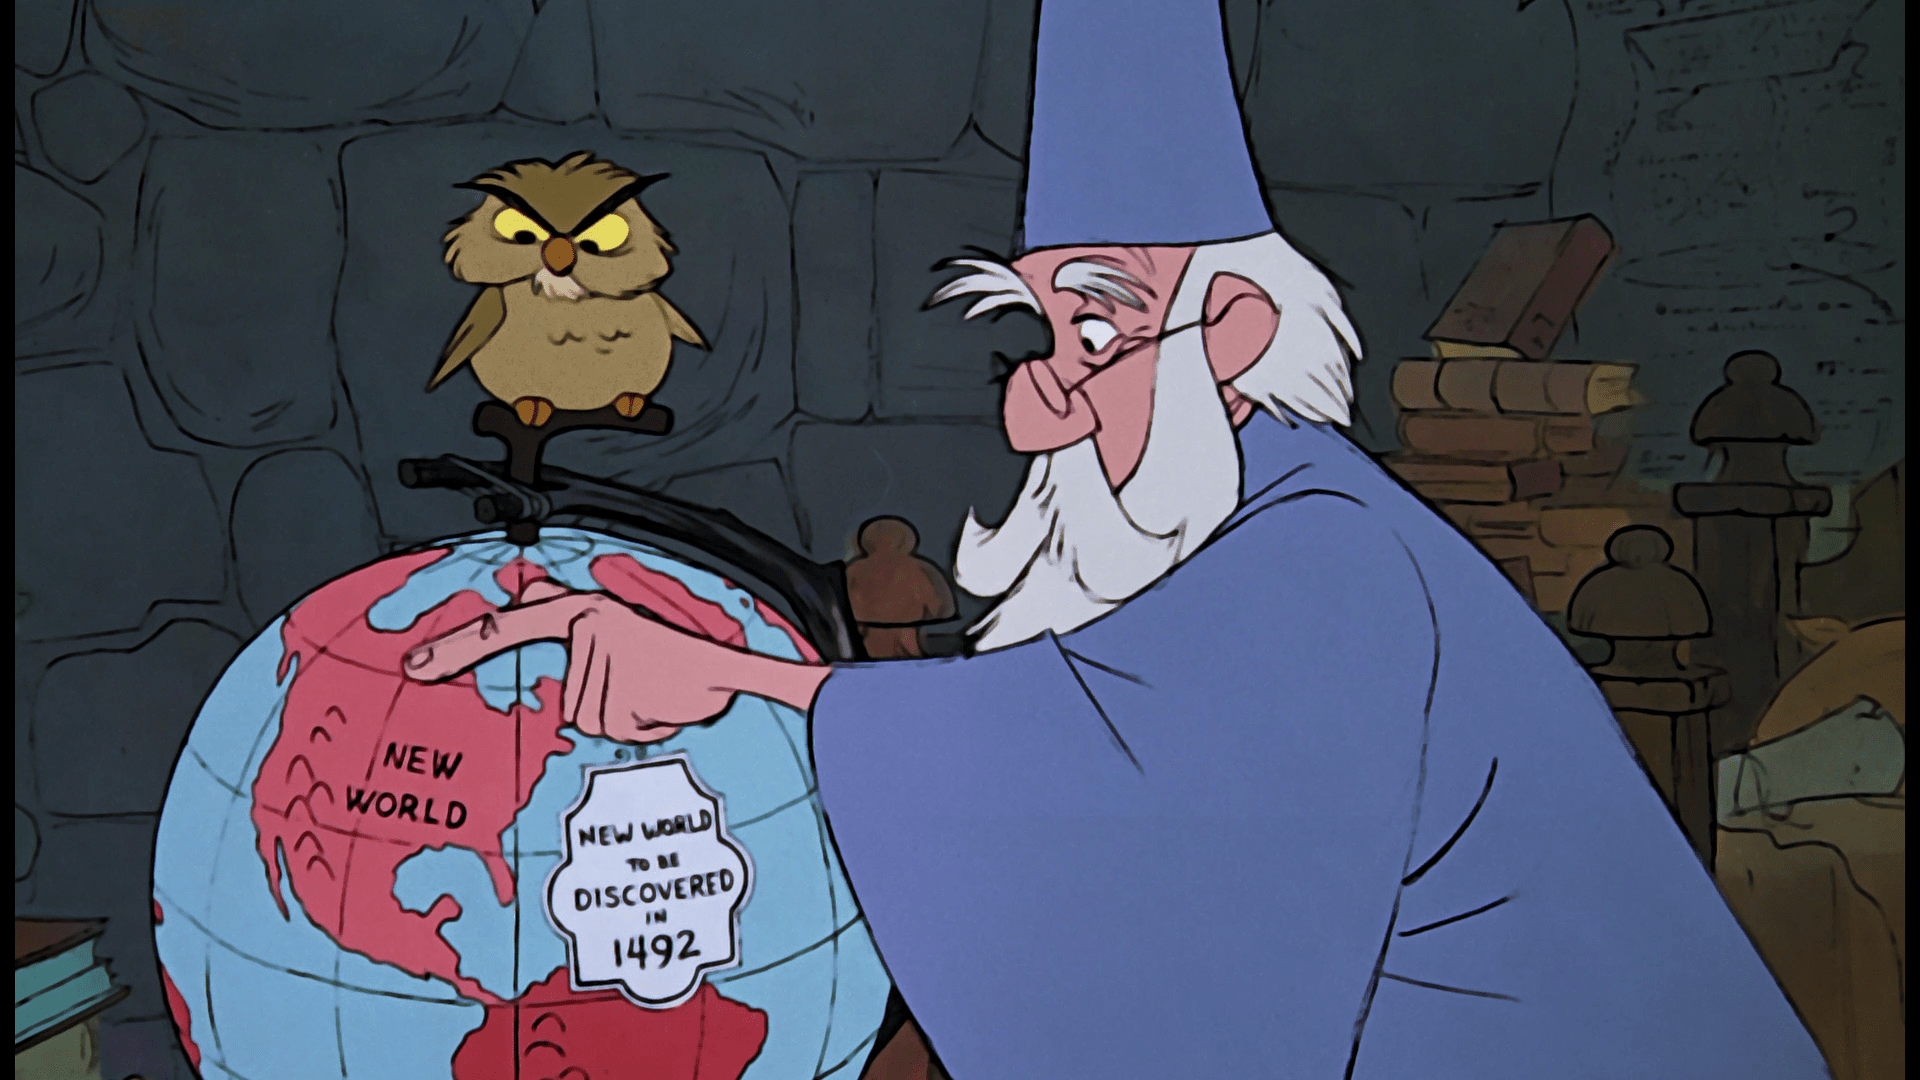 Archimedes e Merlin